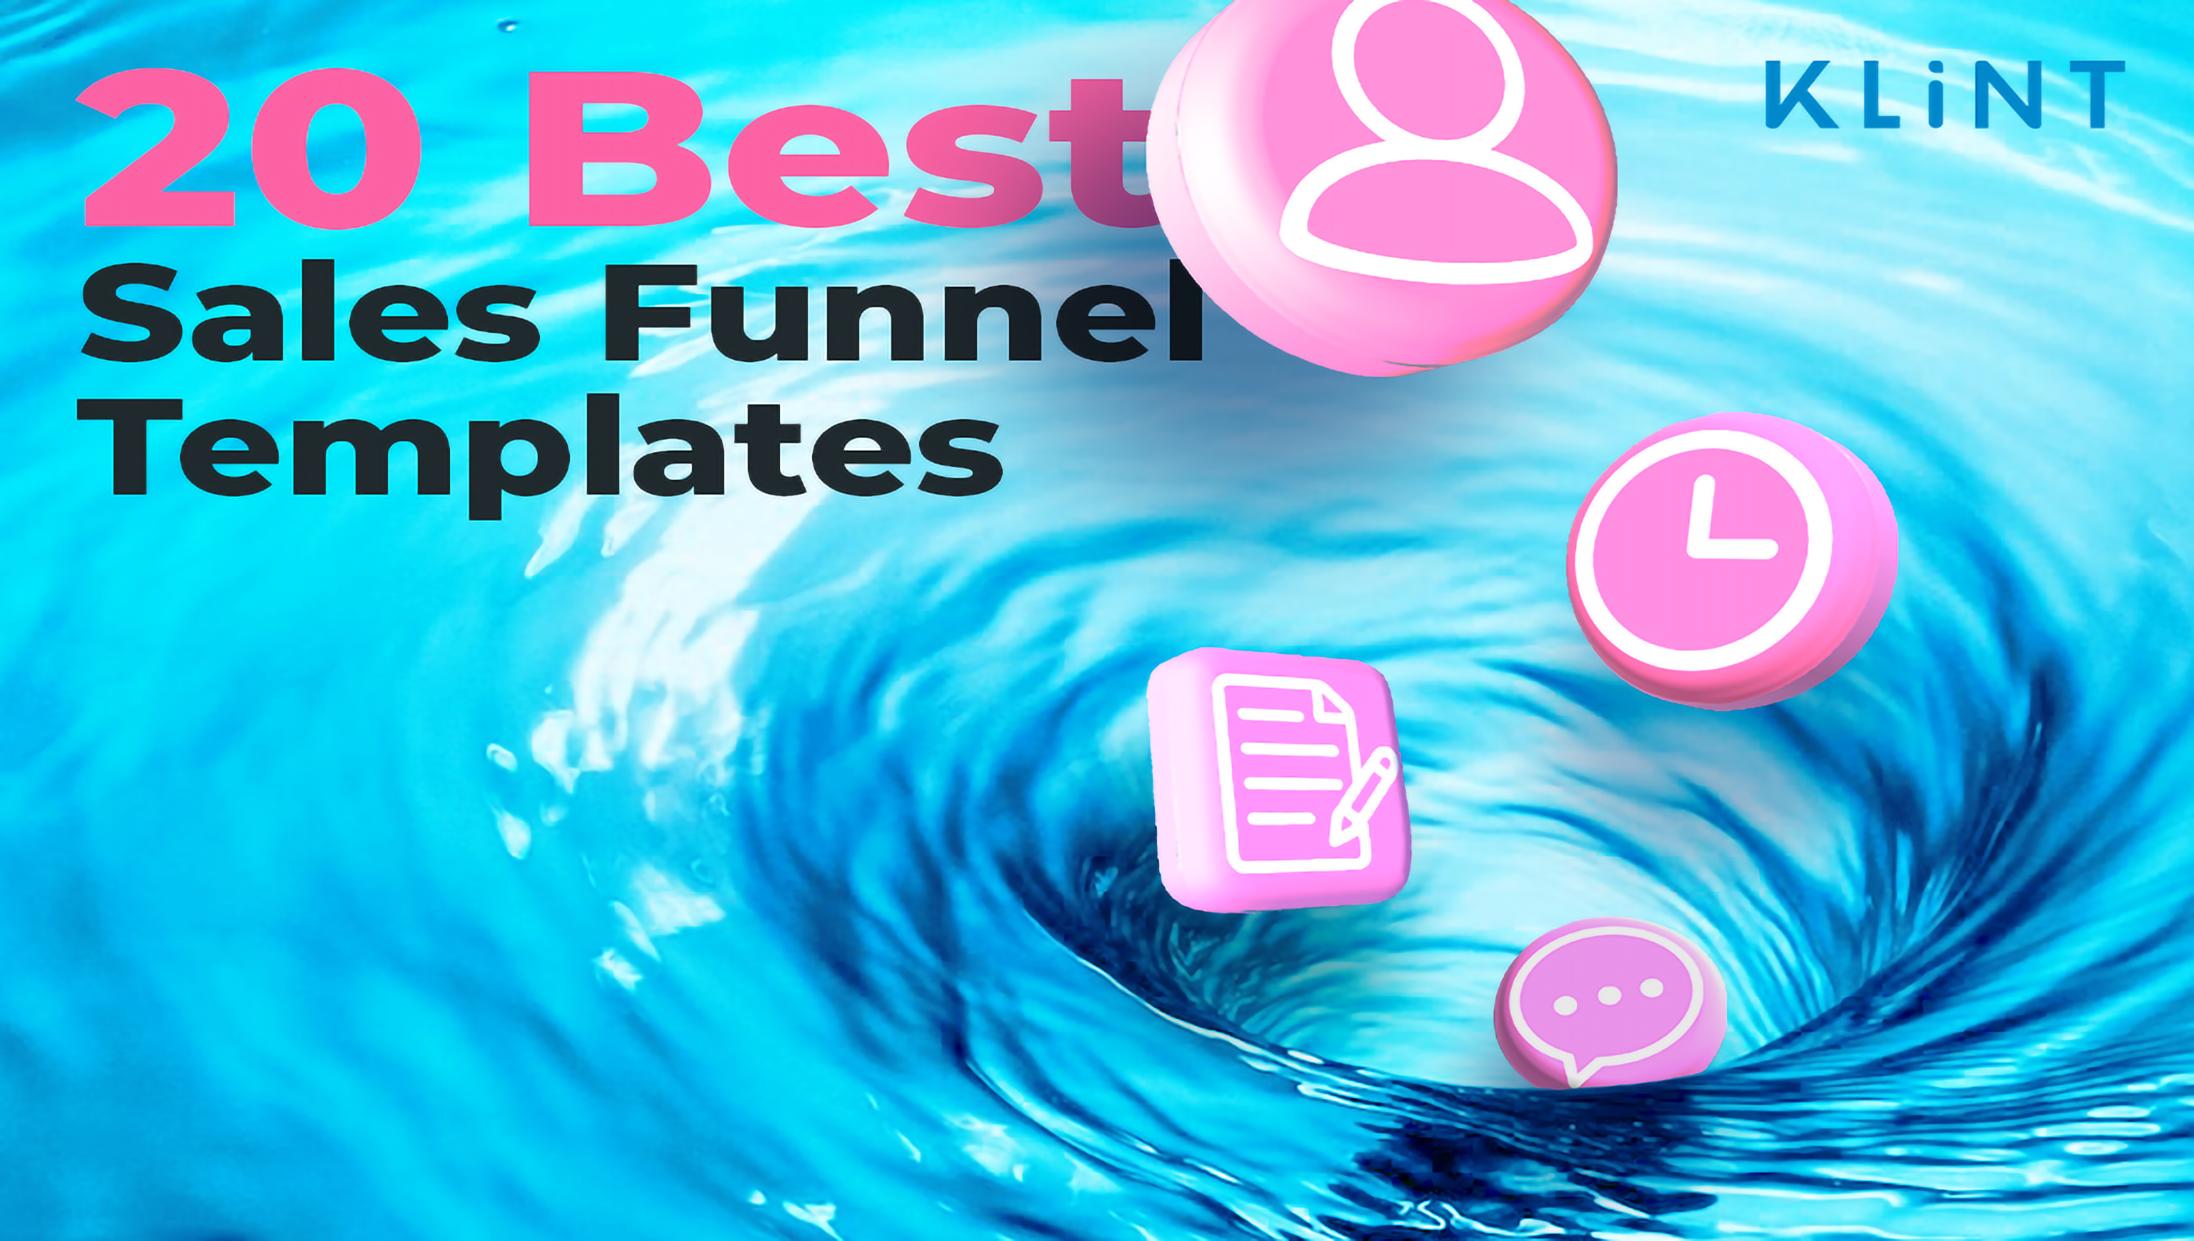 20 Best Sales Funnel Templates